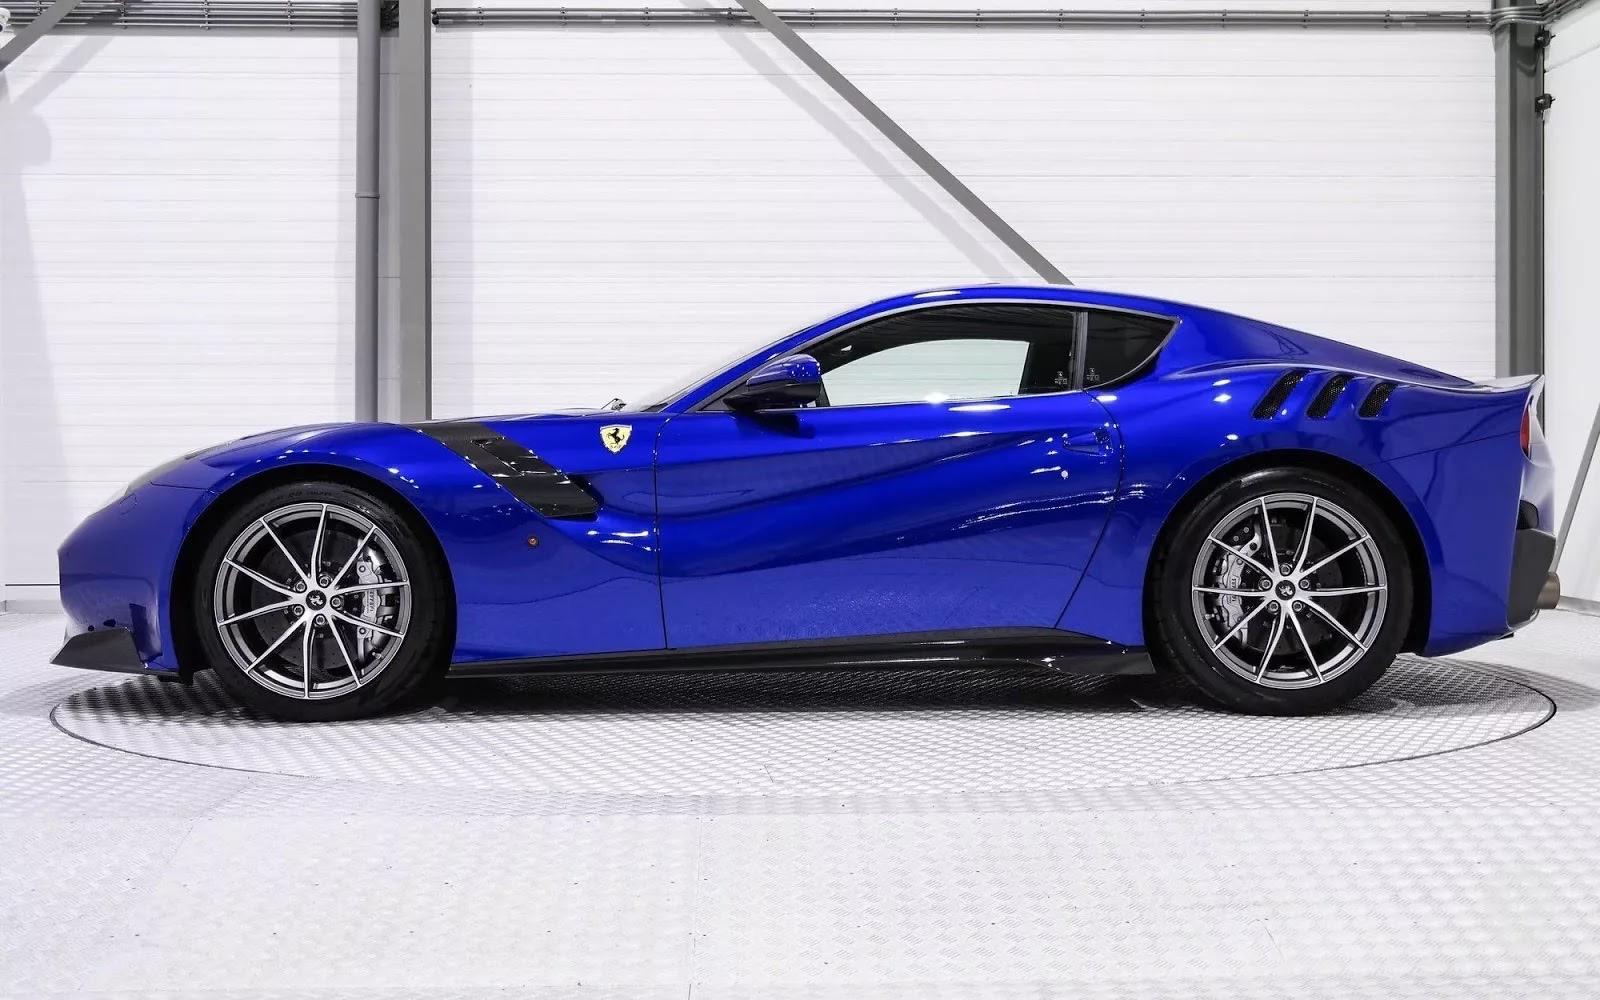 One-Off_Electric_Blue_Ferrari_F12tdf_02